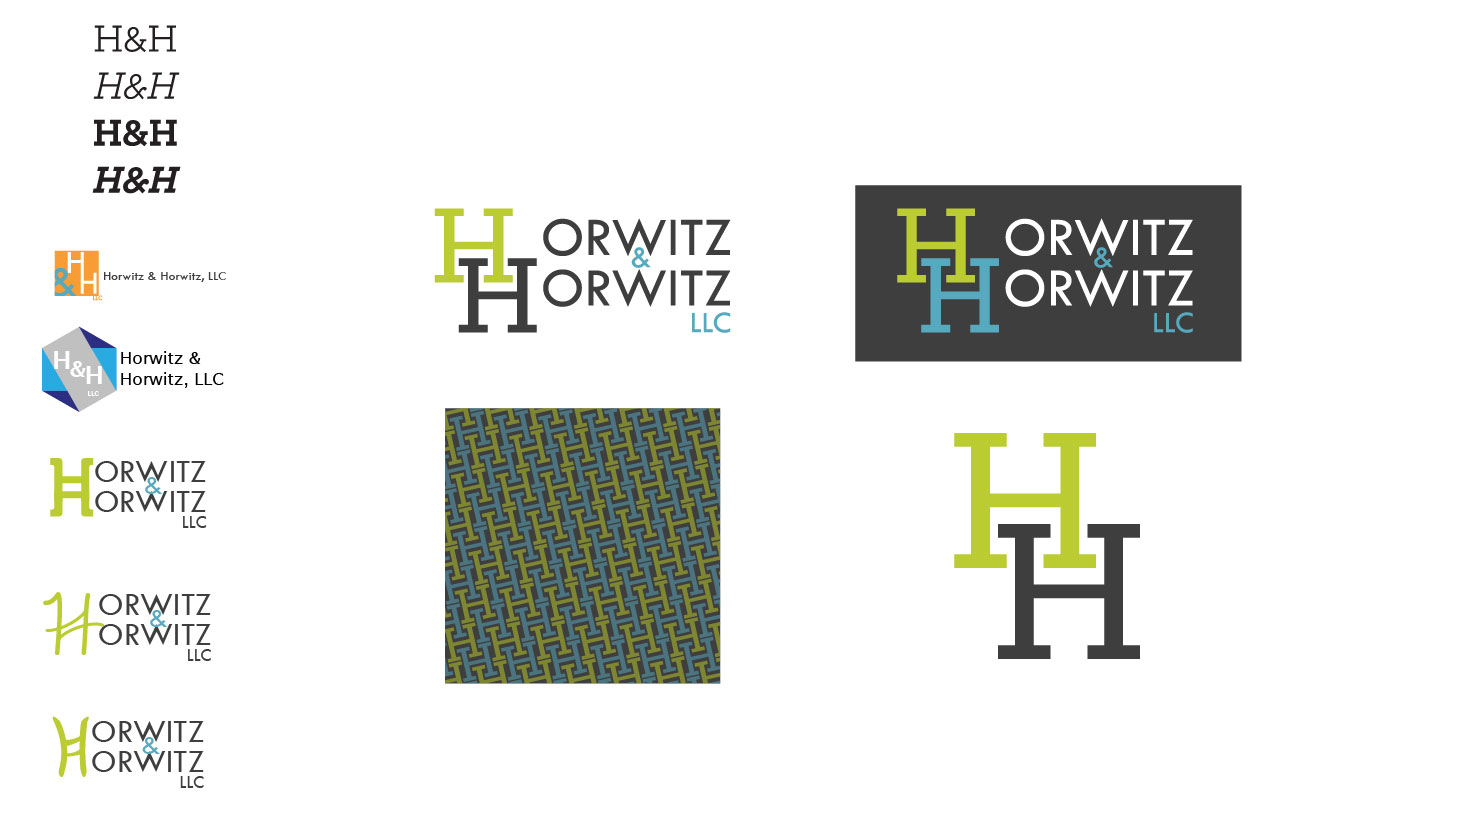 Horwitz & Horwitz, LLC | Brand Identity | Luke Sillies Design